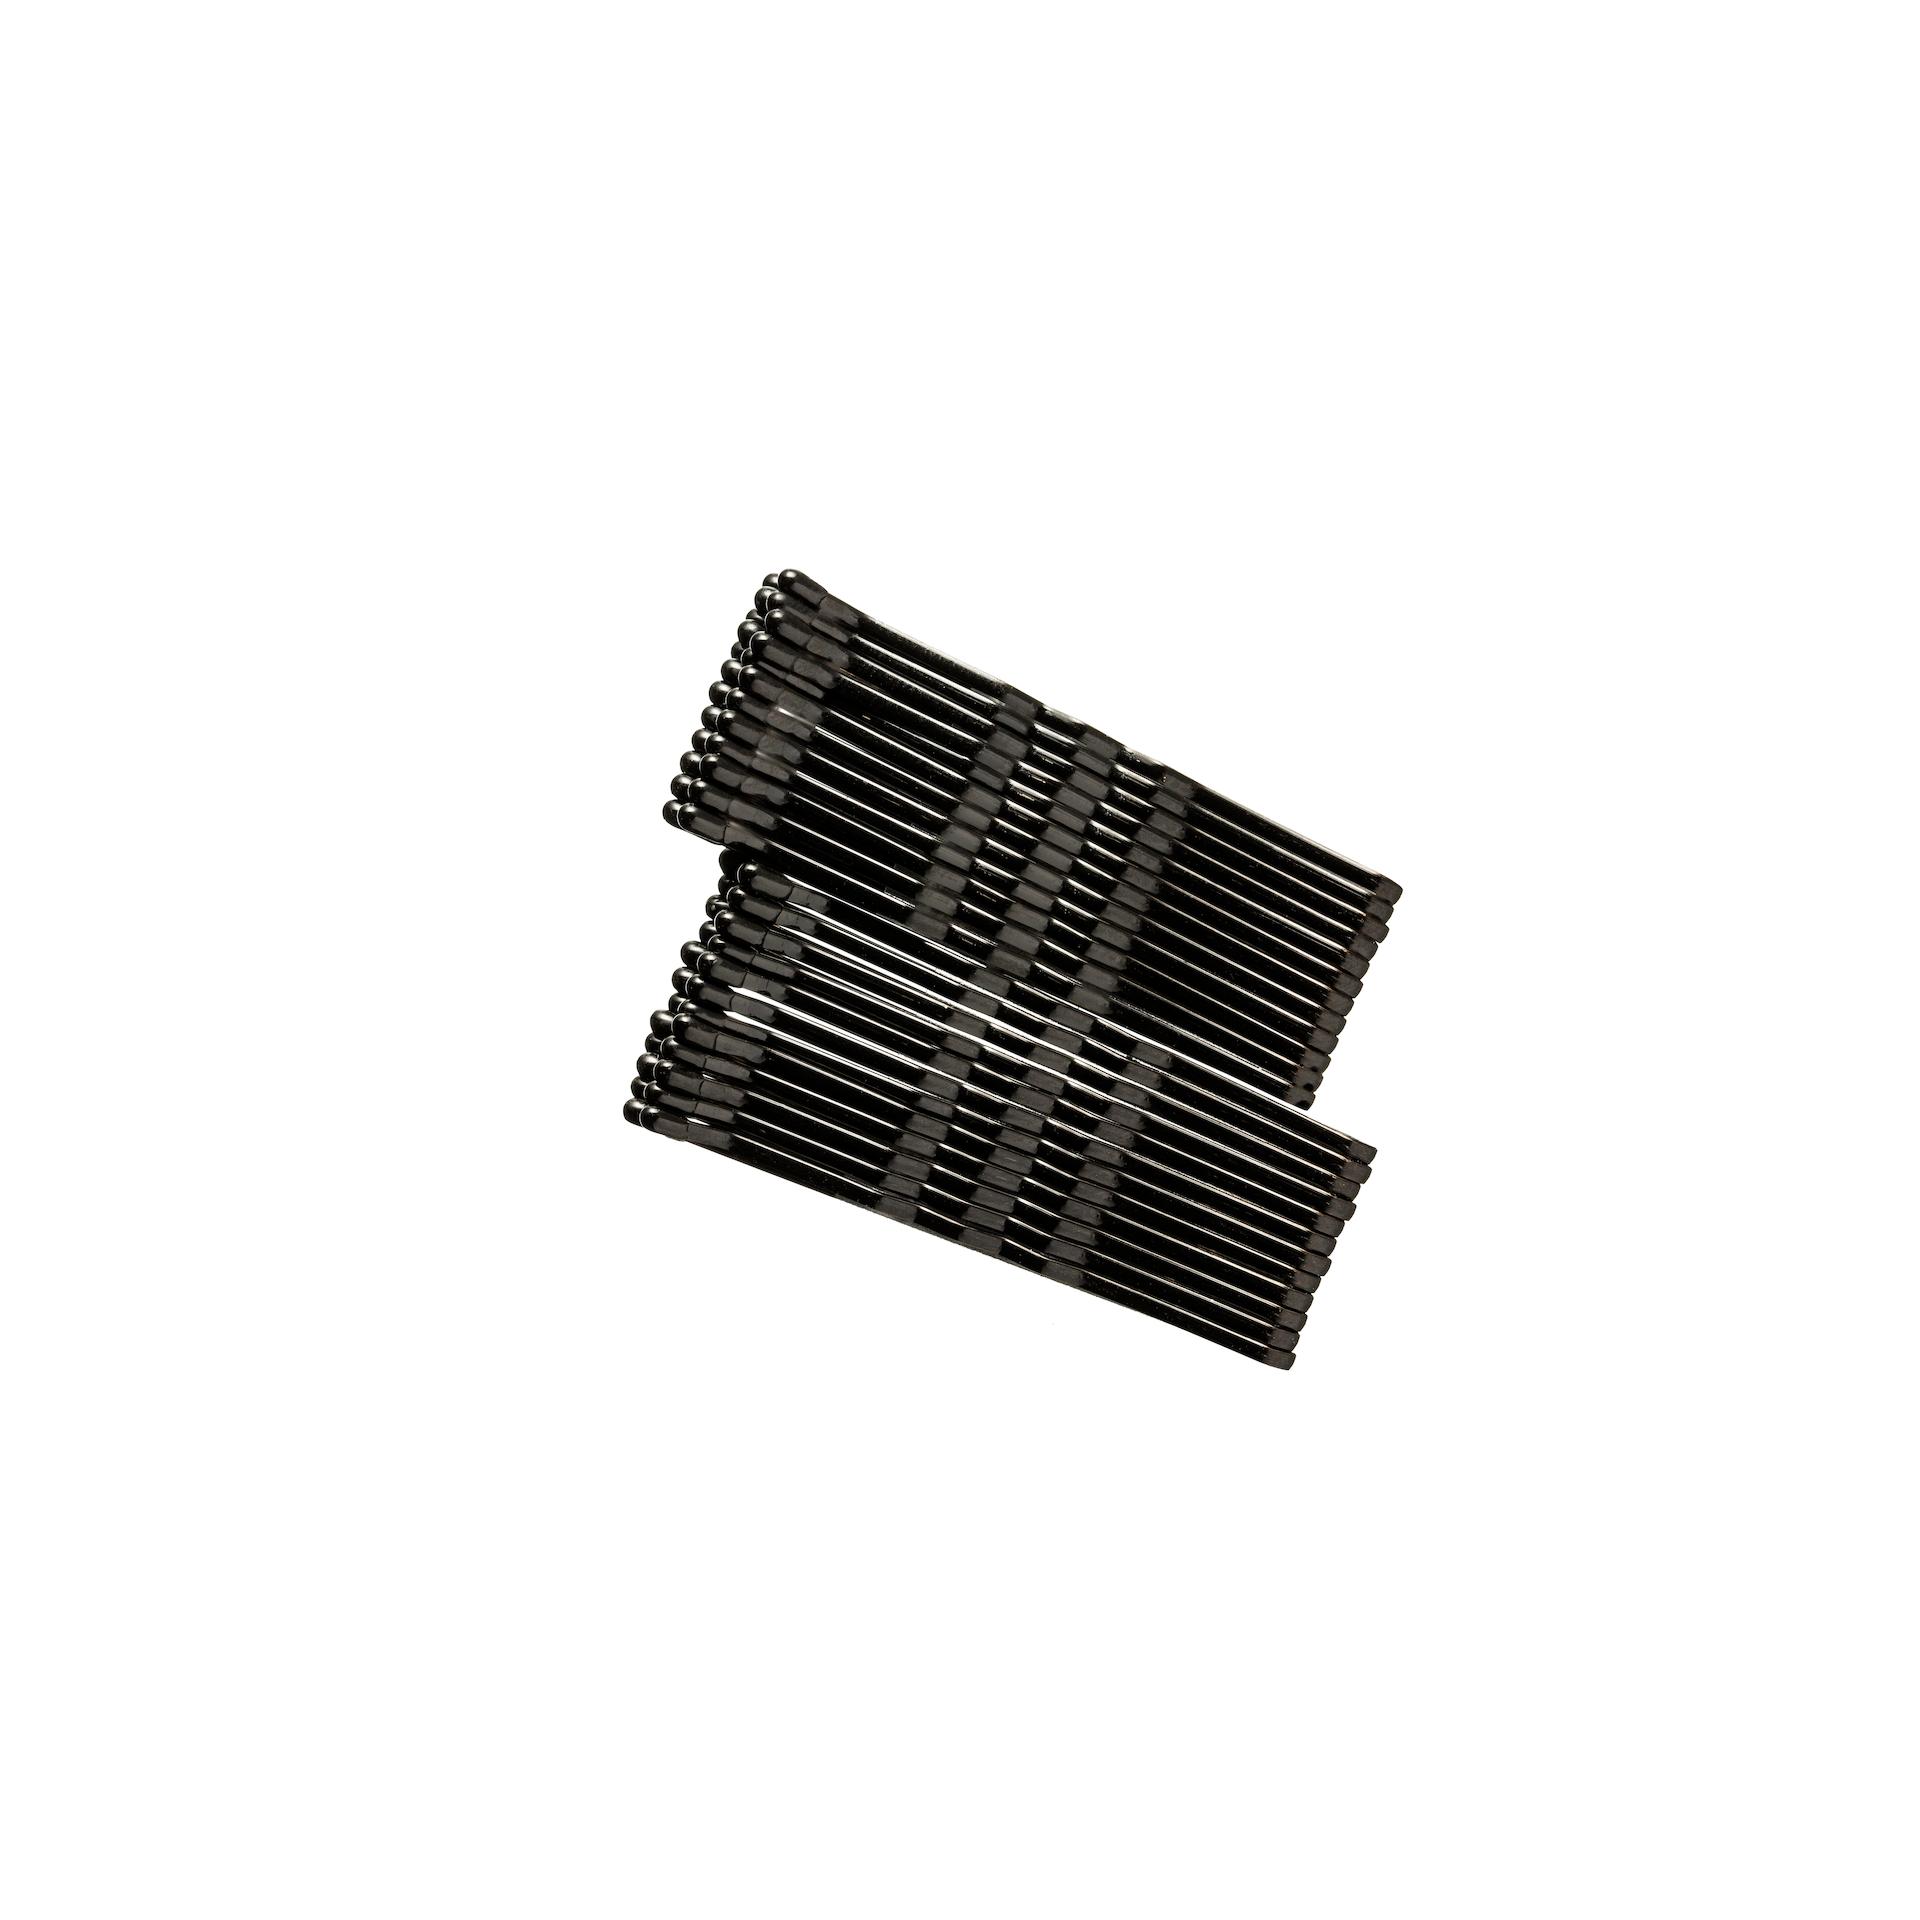 Hair Pin Black 24-pack